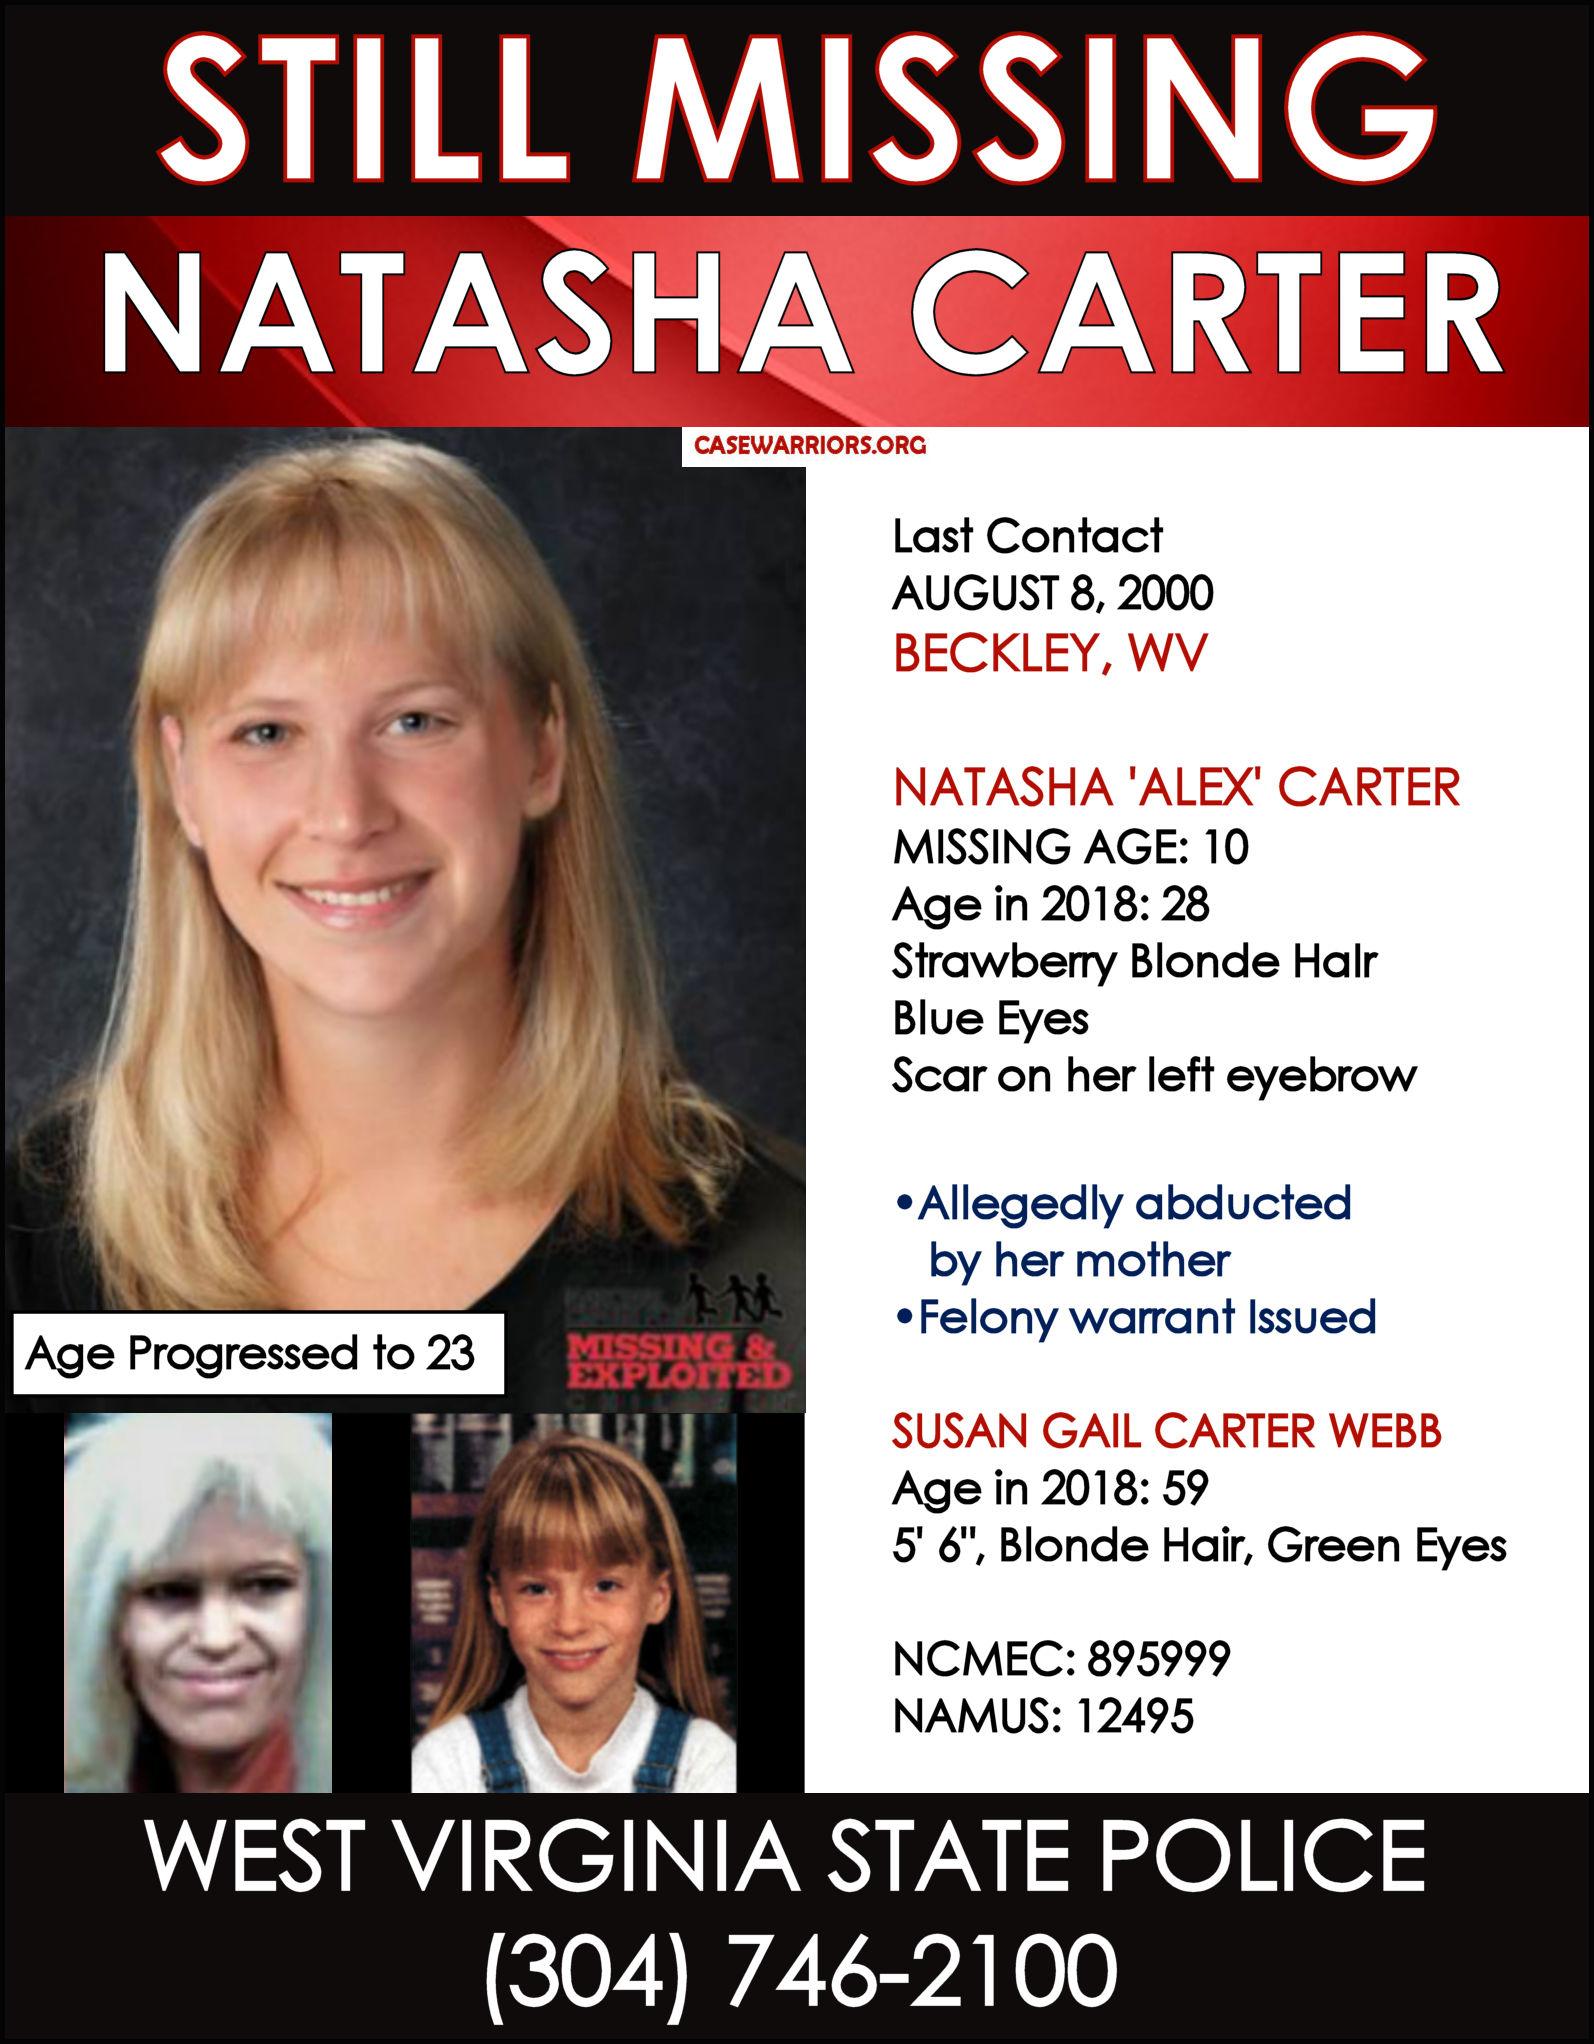 NATASHA CARTER